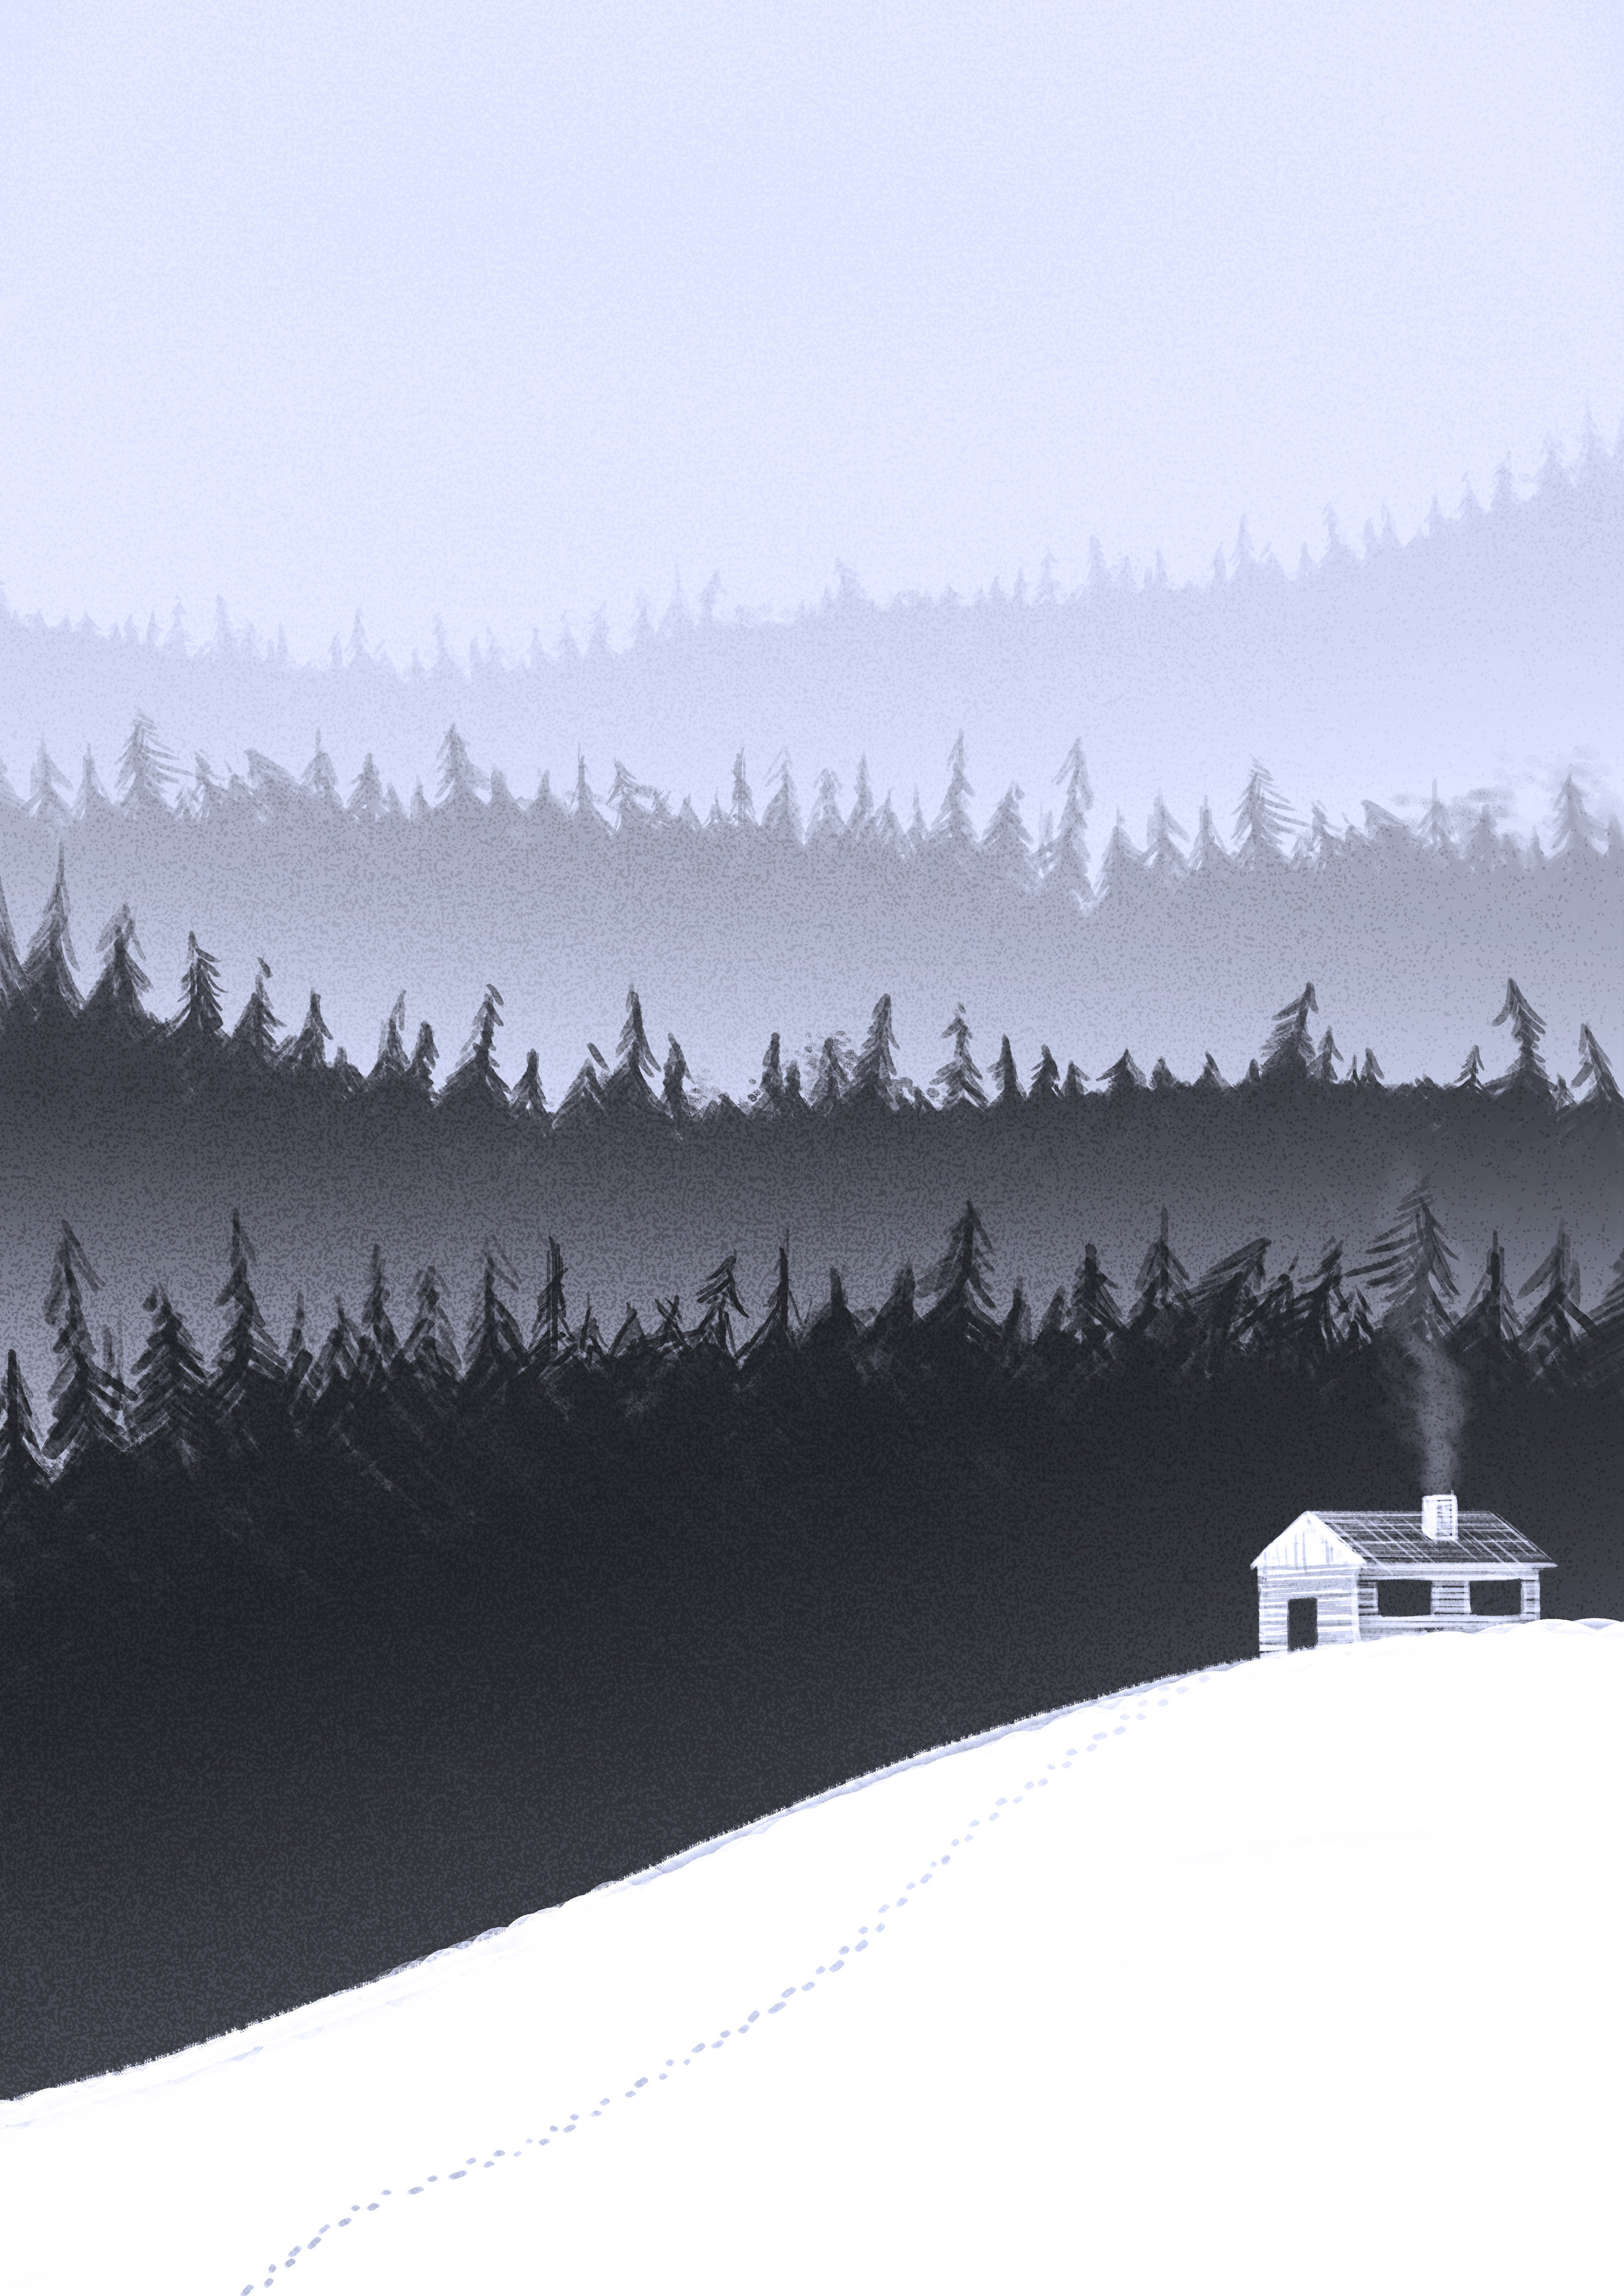 Forest Dwelling v5.jpg